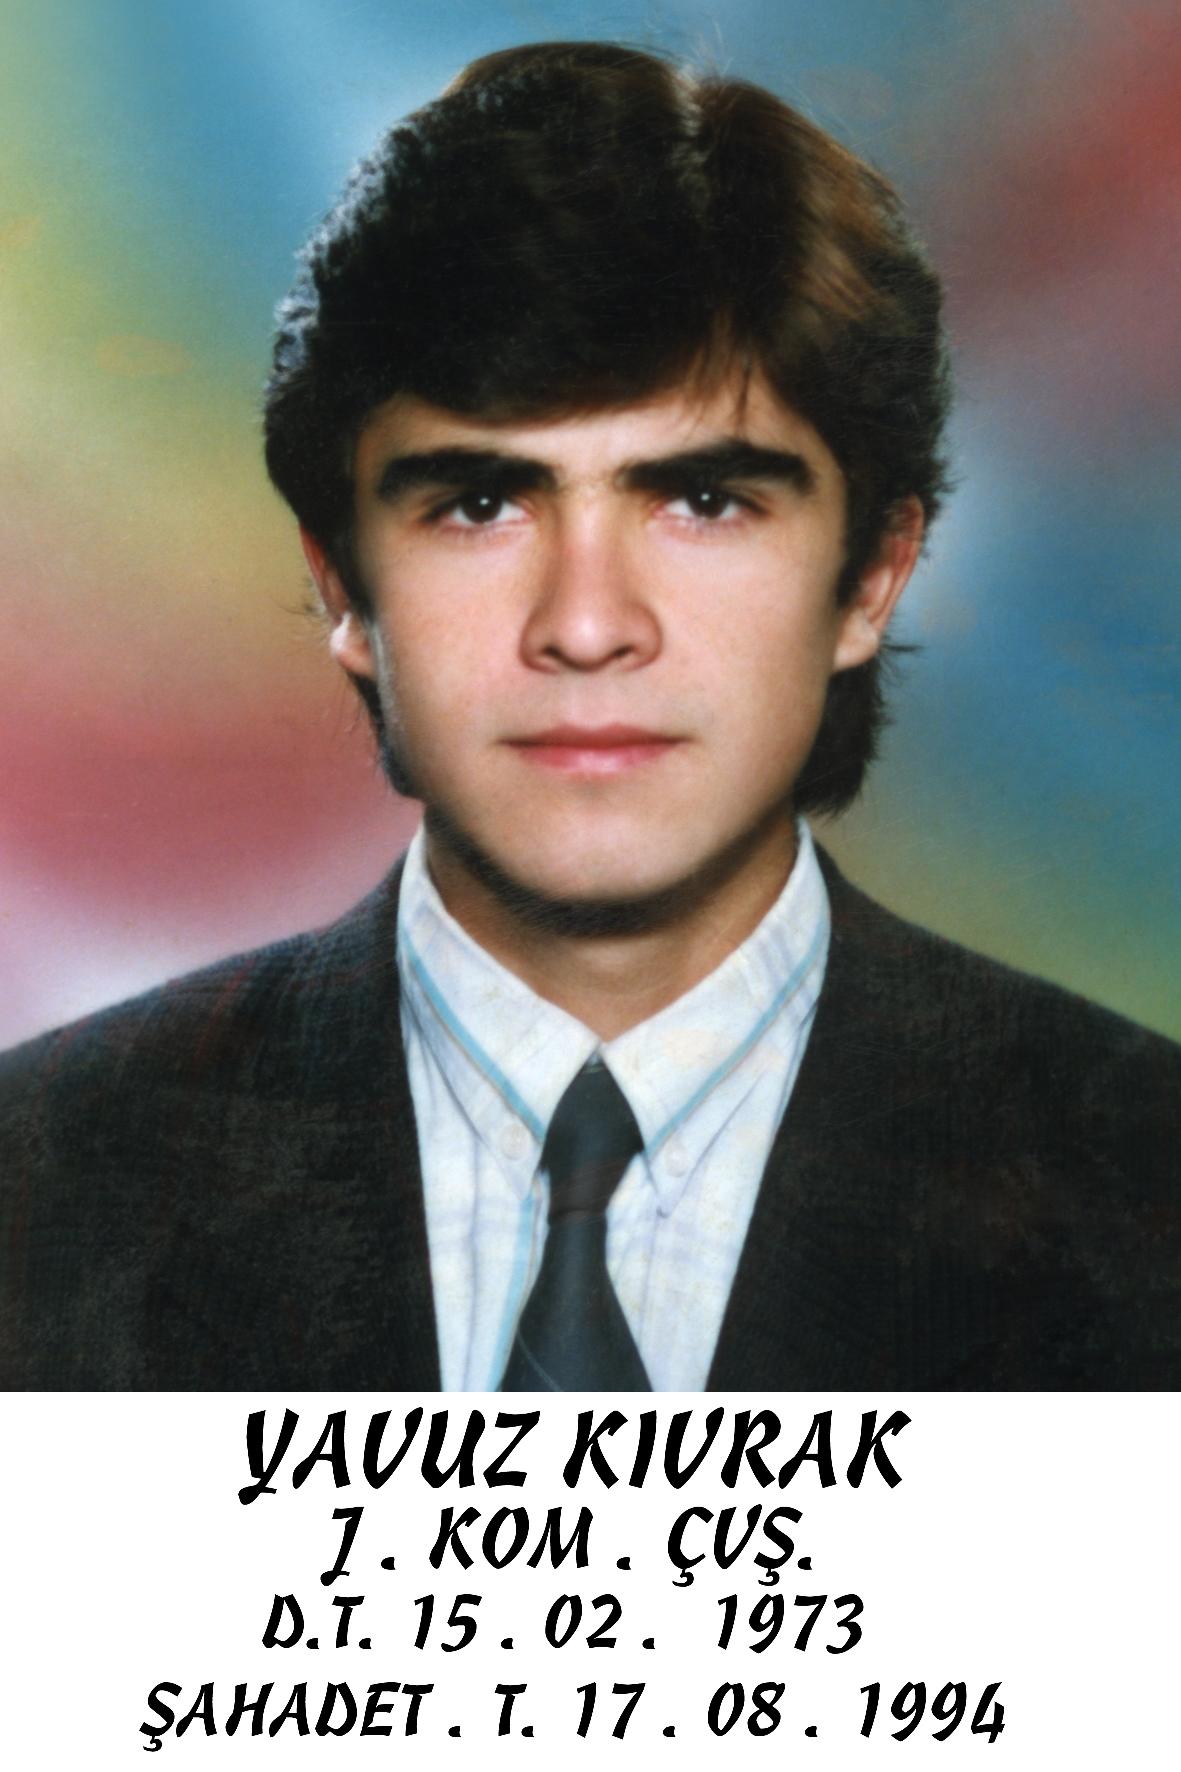 YAVUZ KIVRAK